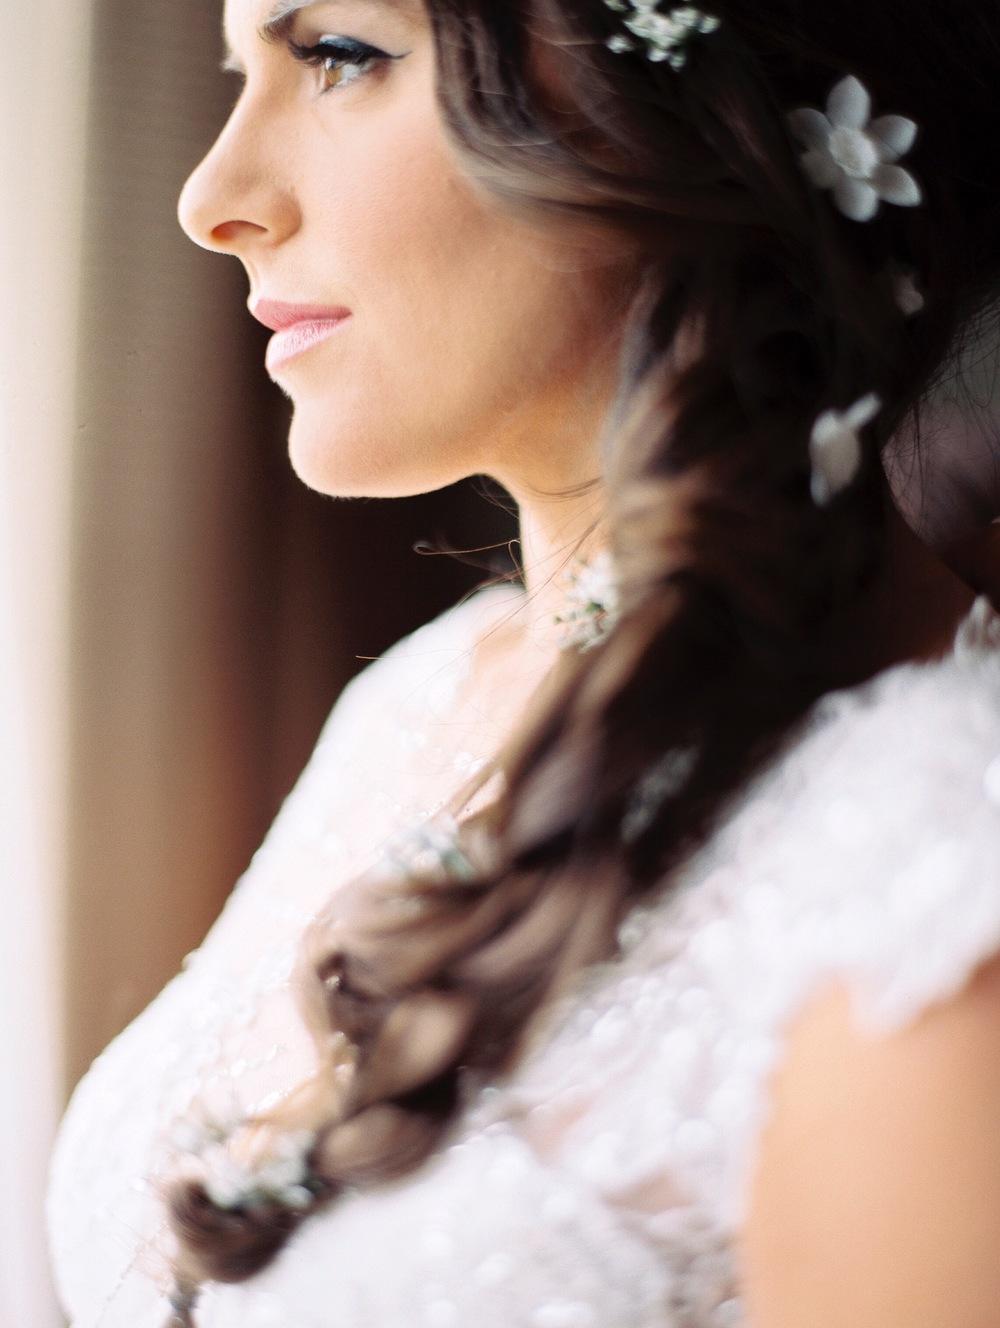 Columbia Weddings | Airbrush Makeup Artist | Tymia Yvette